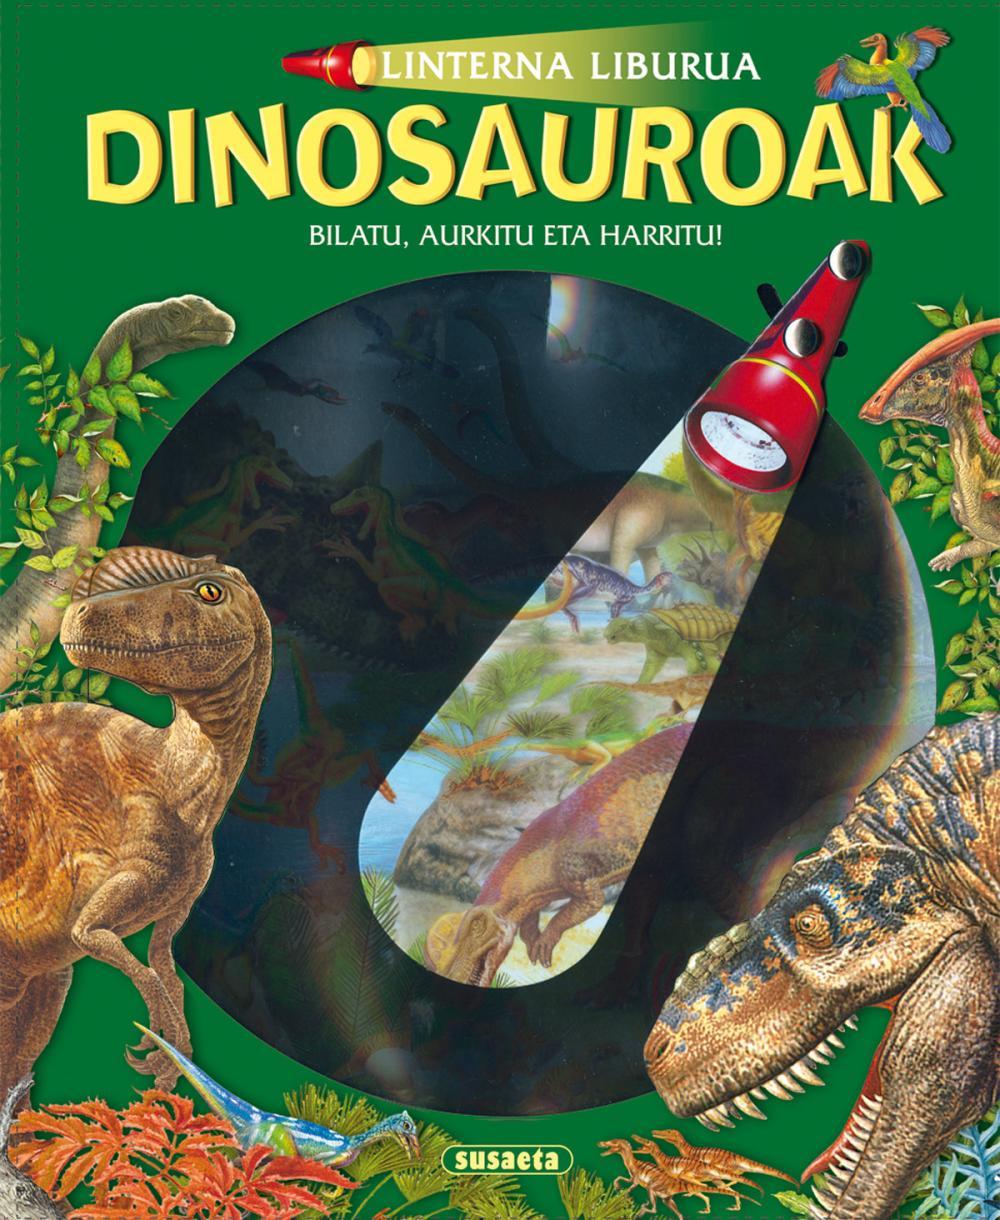 Dinosauroak